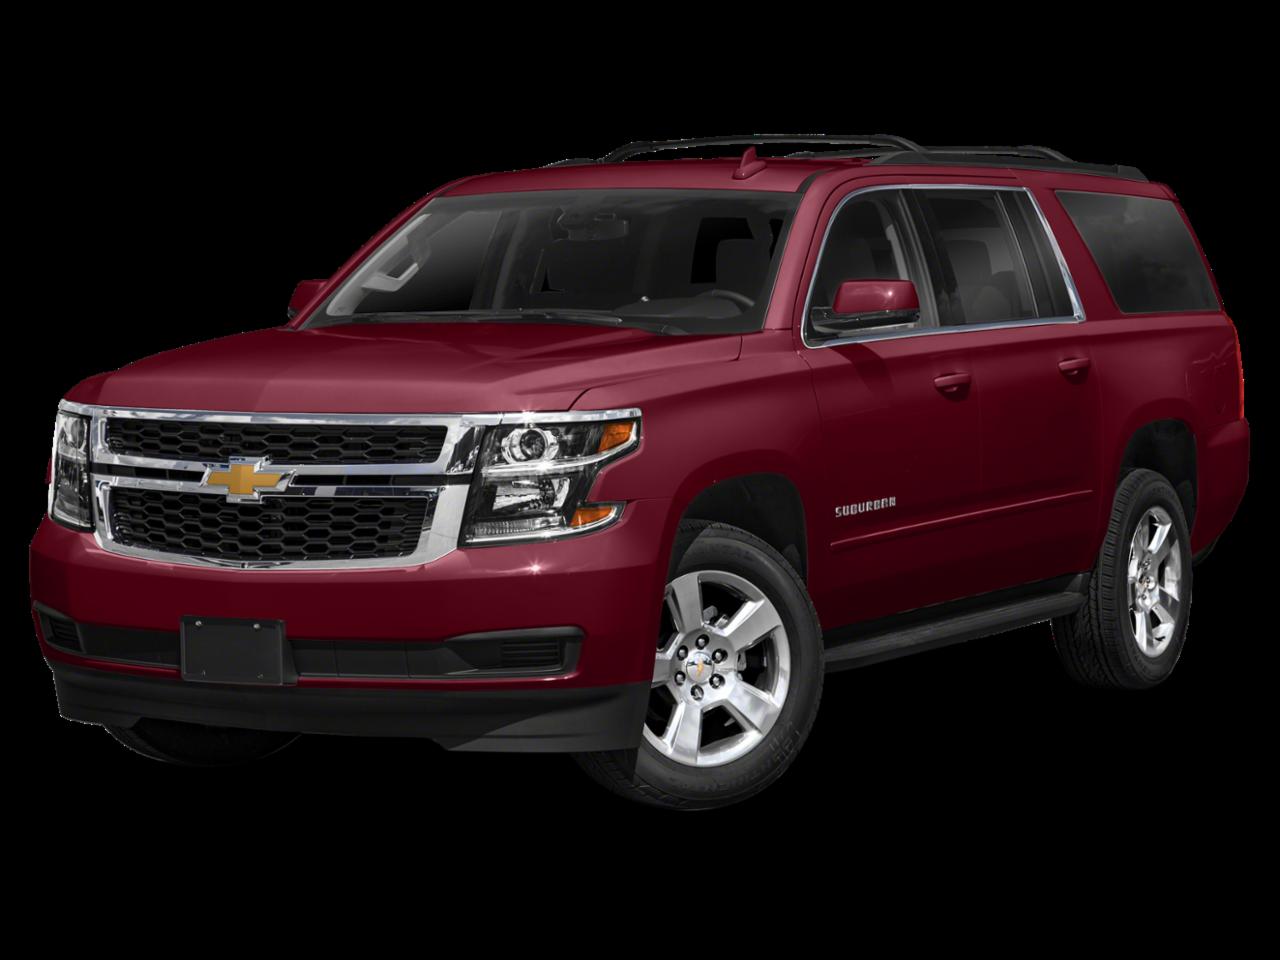 Chevrolet 2019 Suburban LS